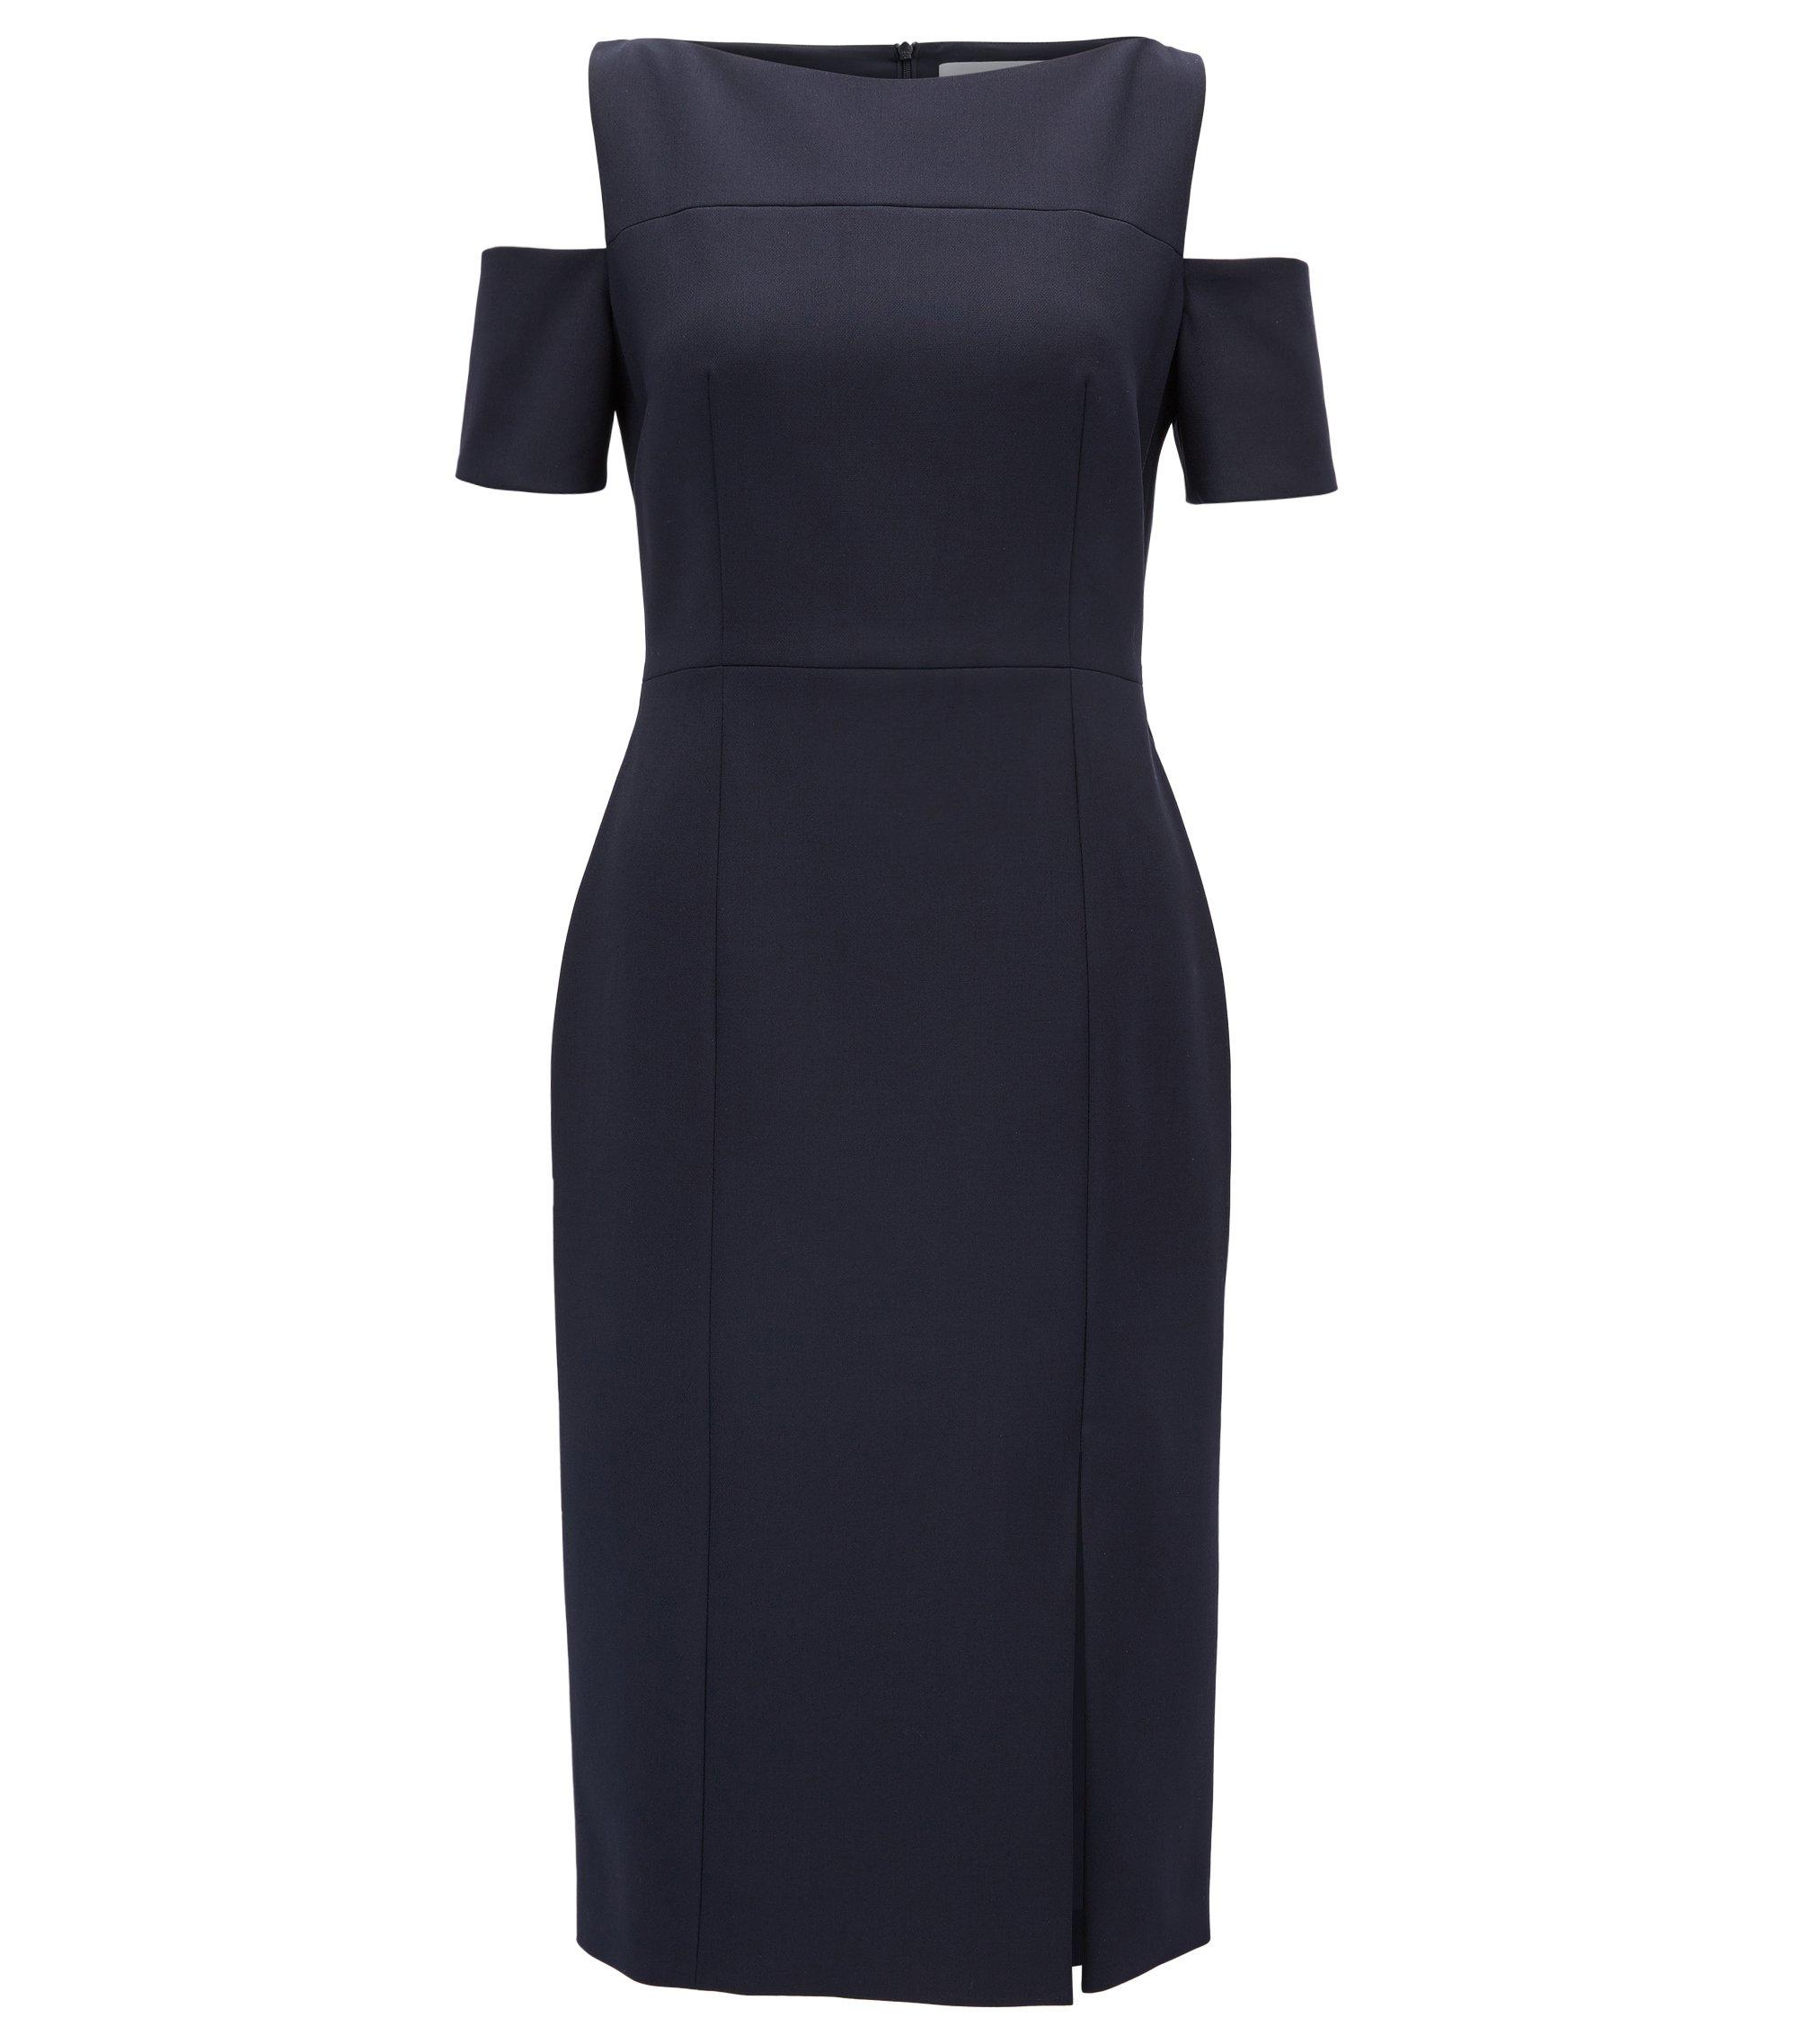 Schouderloze jurk van lichte crêpe, Donkerblauw